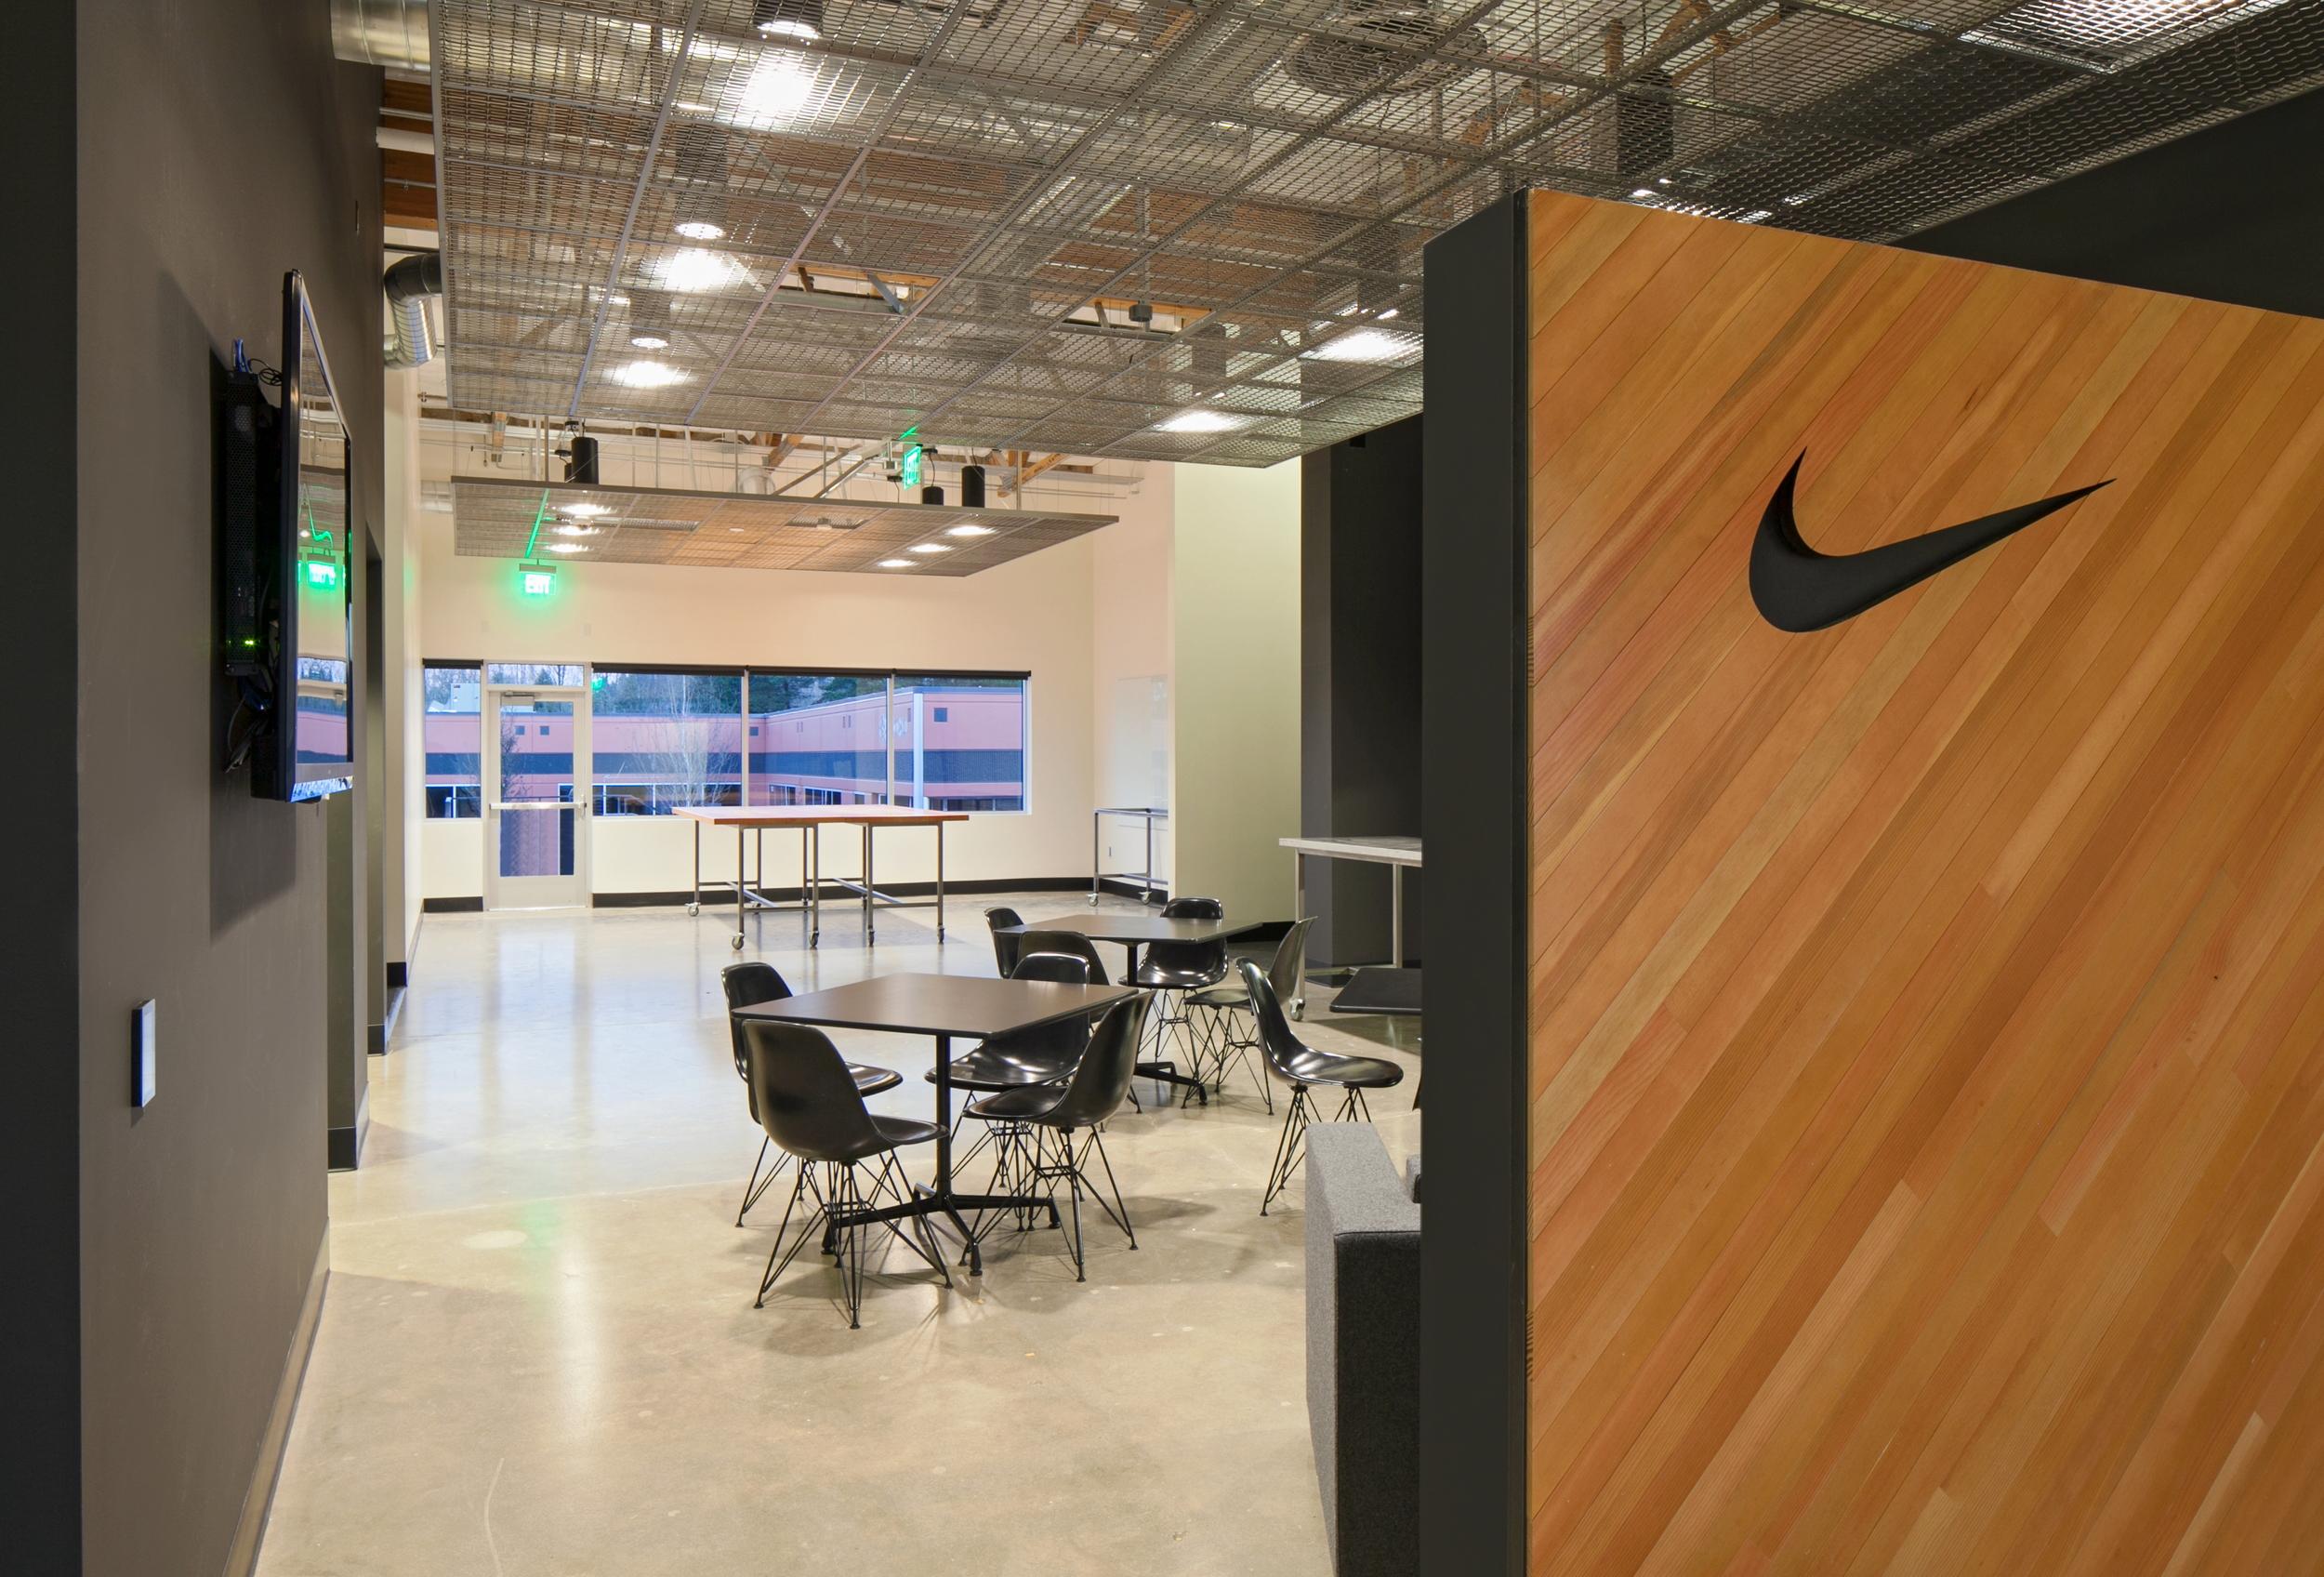 Nike Jay Street Office Renovation